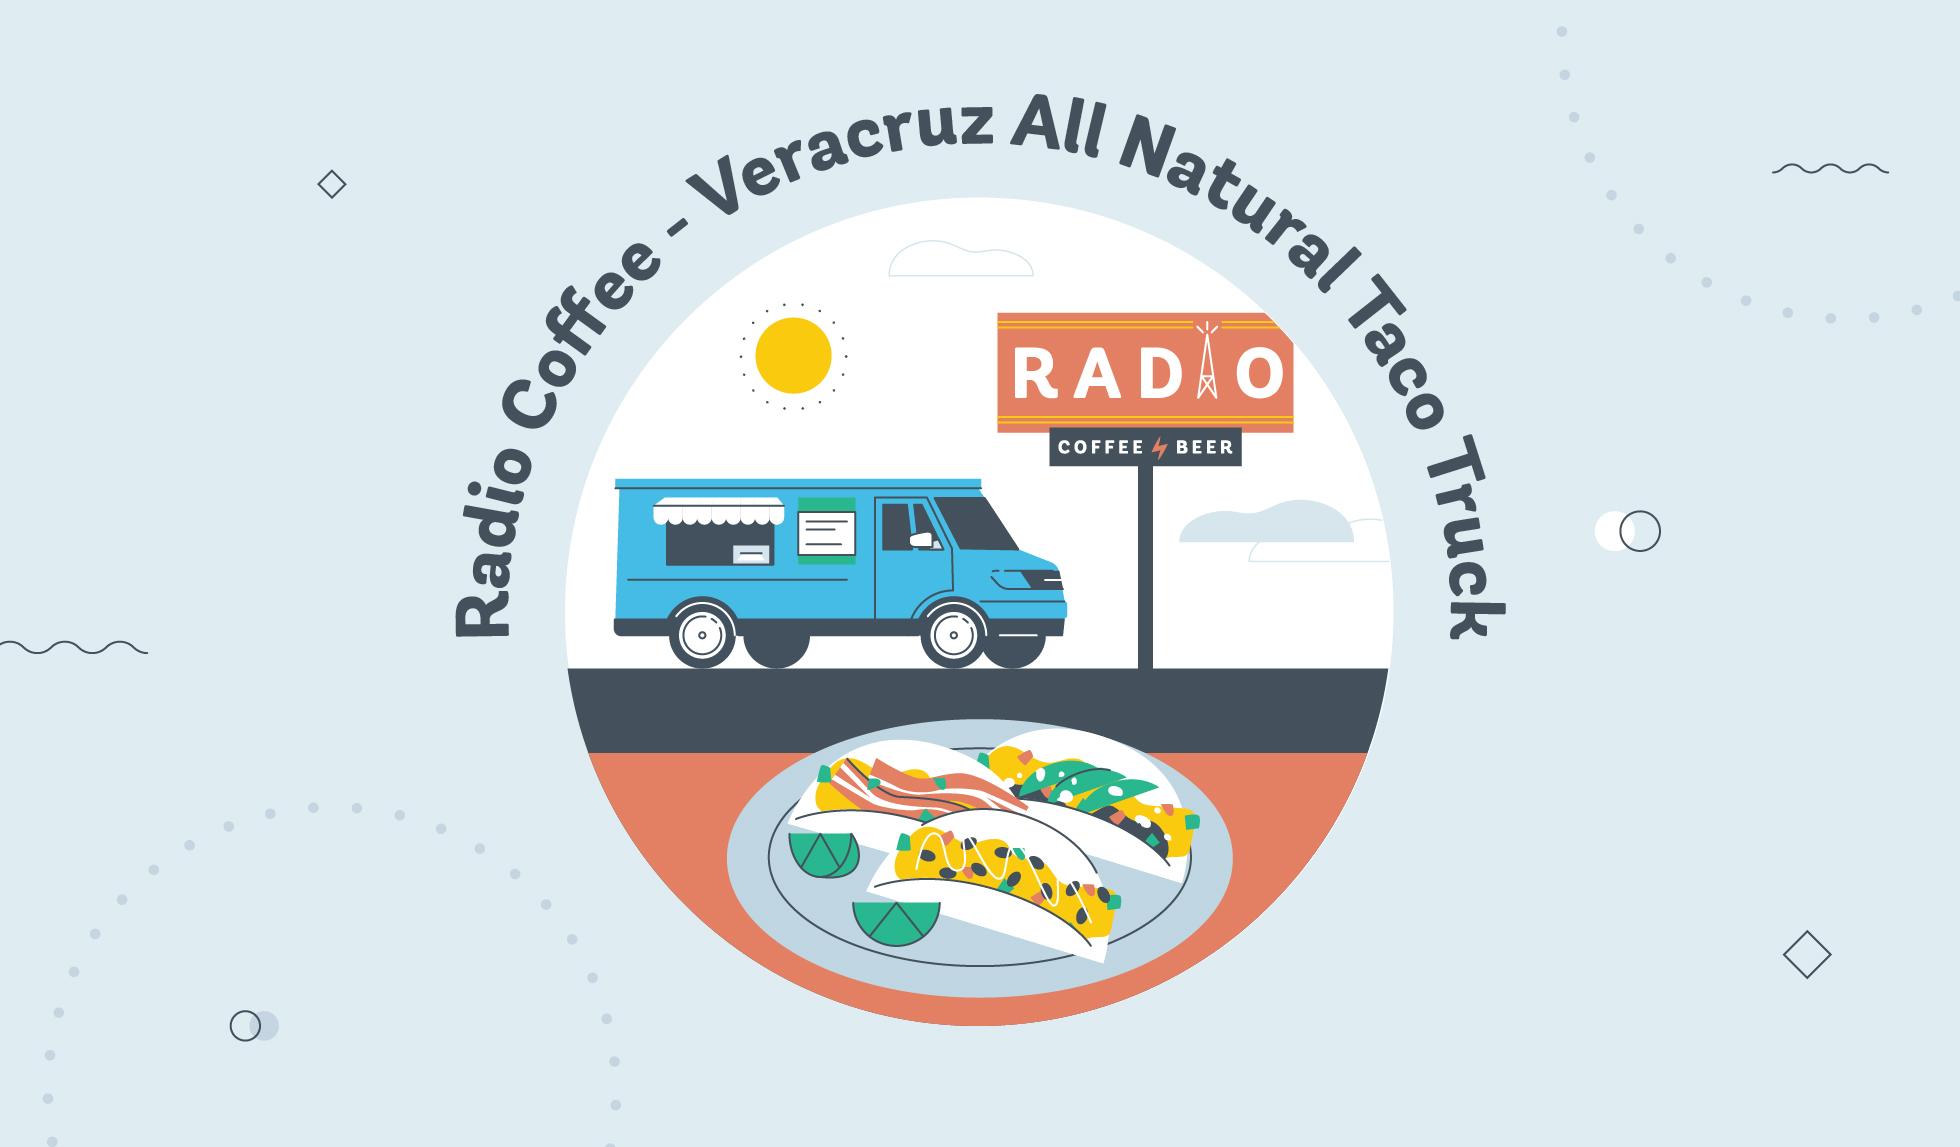 Radio Coffee - Veracruz Al Natural Taco Truckgraphic